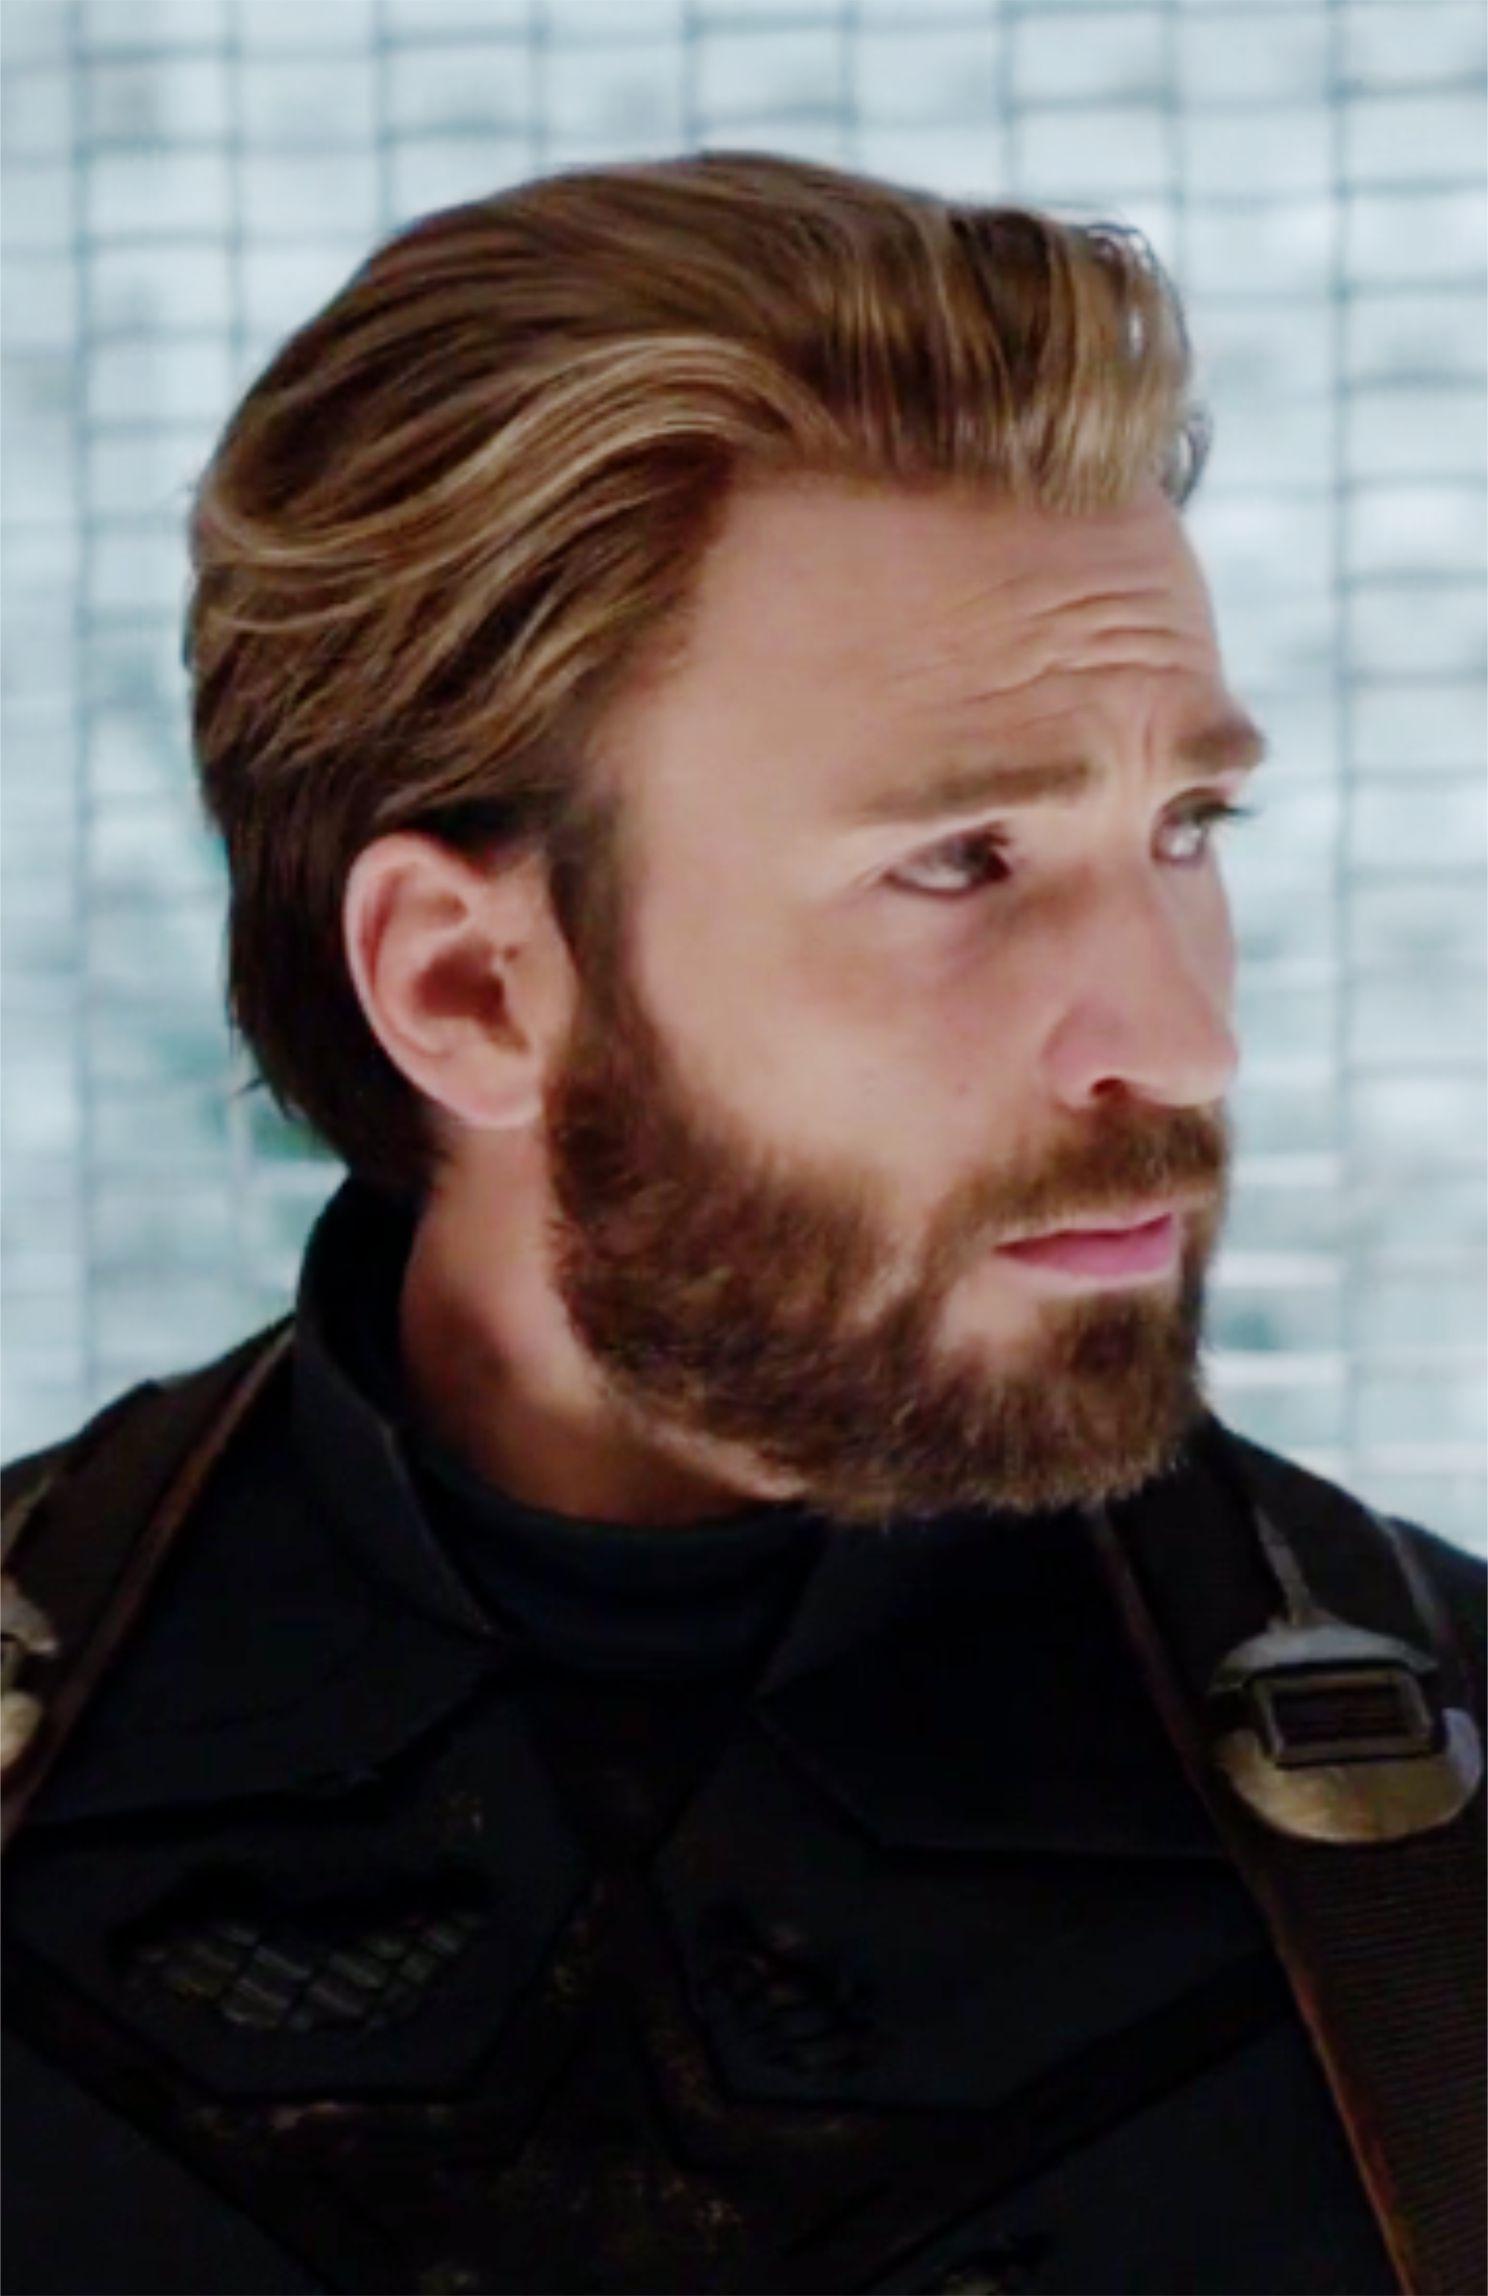 Captain America Hair Infinity War : captain, america, infinity, Captain, America, Infinity, Chris, Evans, Girlfriend,, Haircut,, Beard